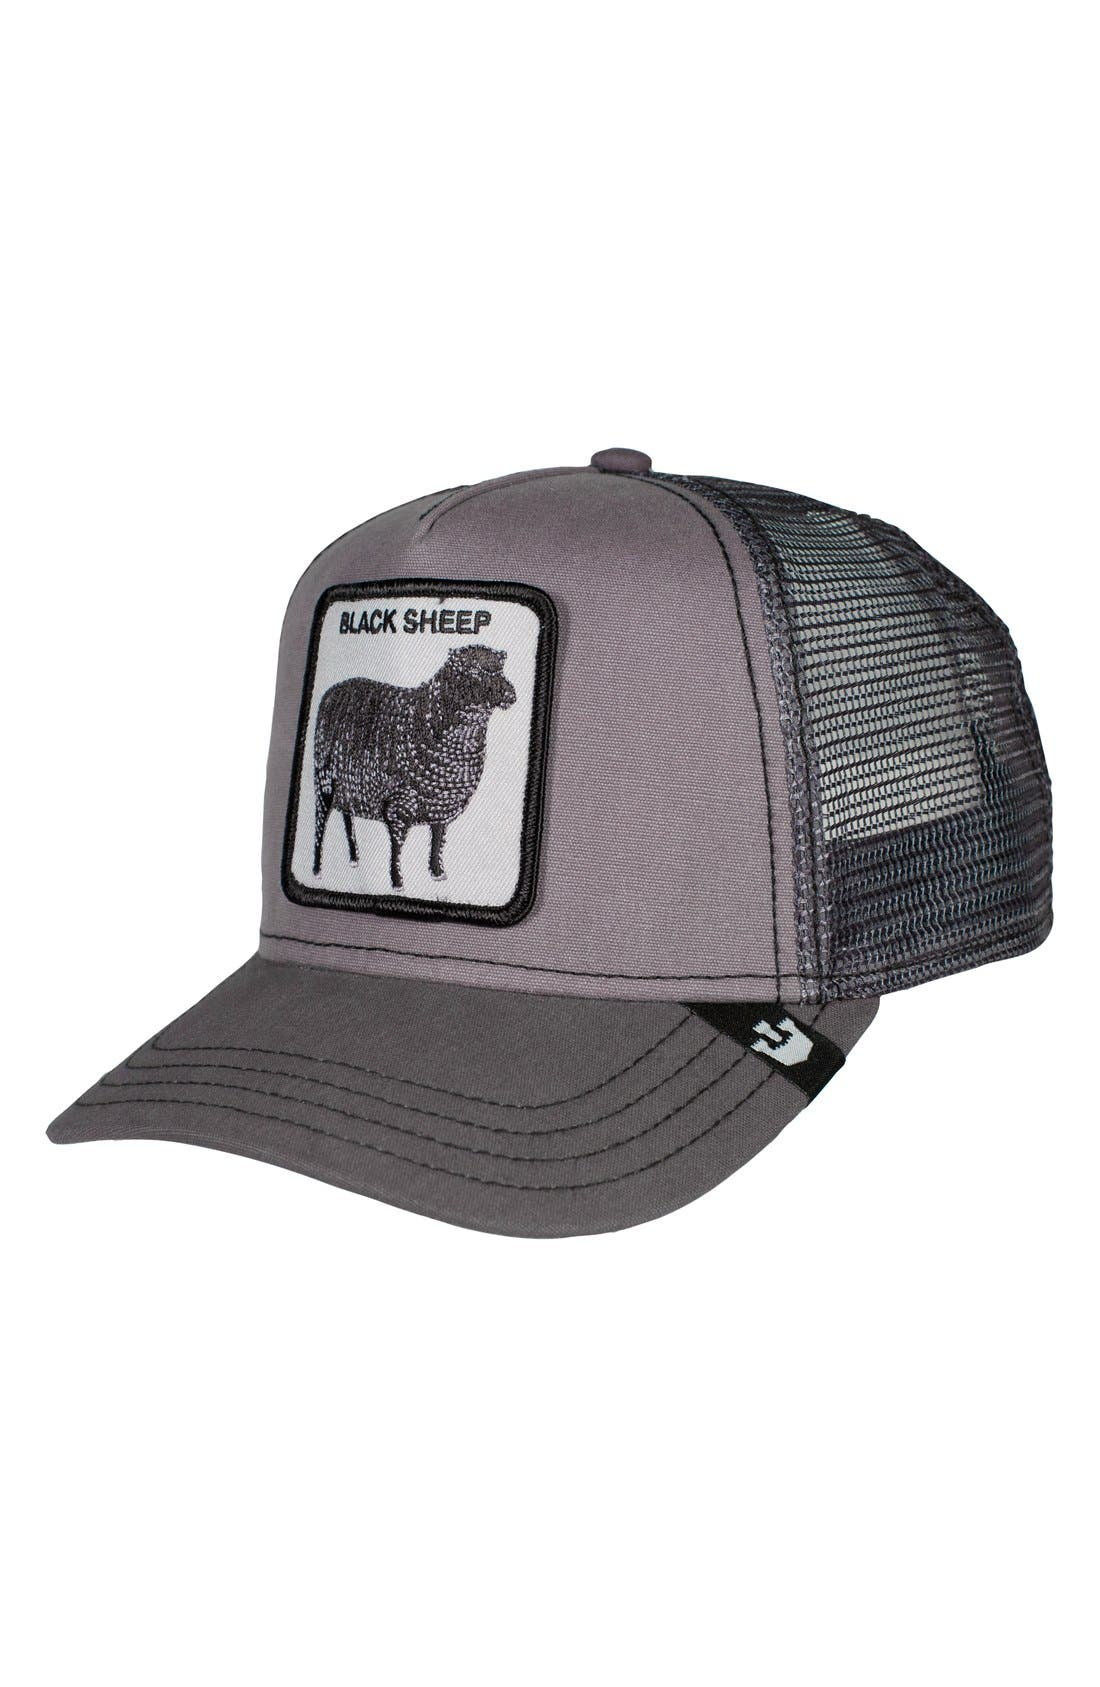 GOORIN BROTHERS Shades of Black Mesh Trucker Hat